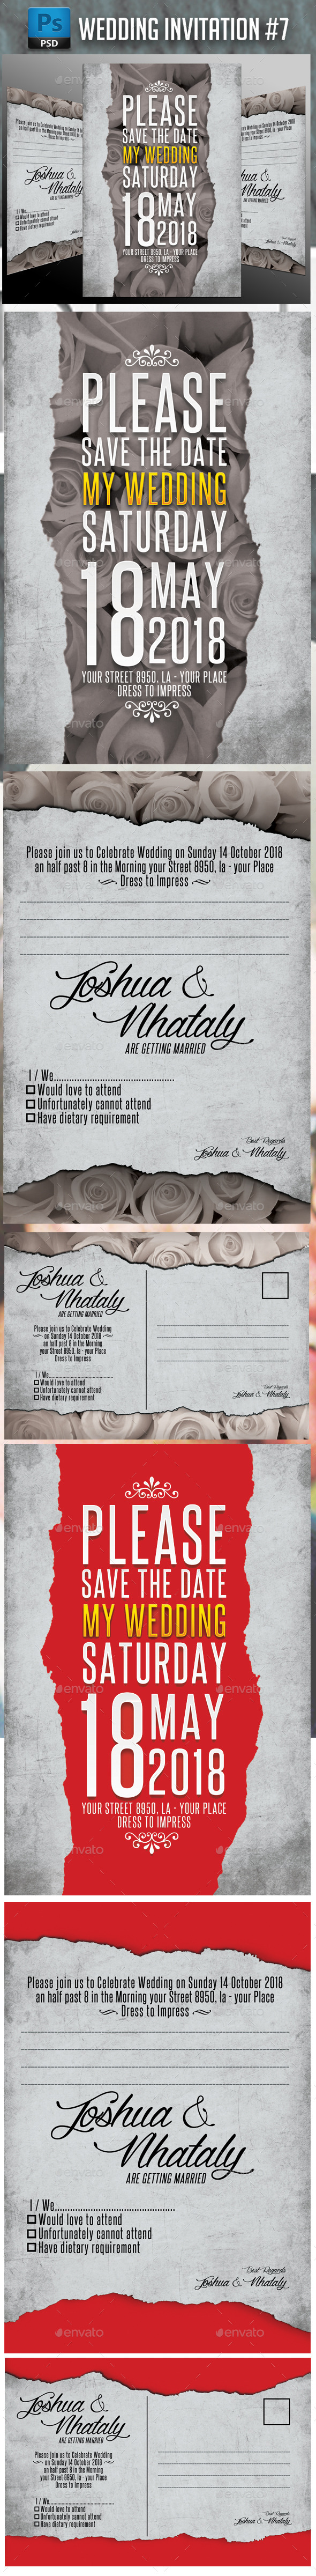 Wedding Invitation #7 - Weddings Cards & Invites